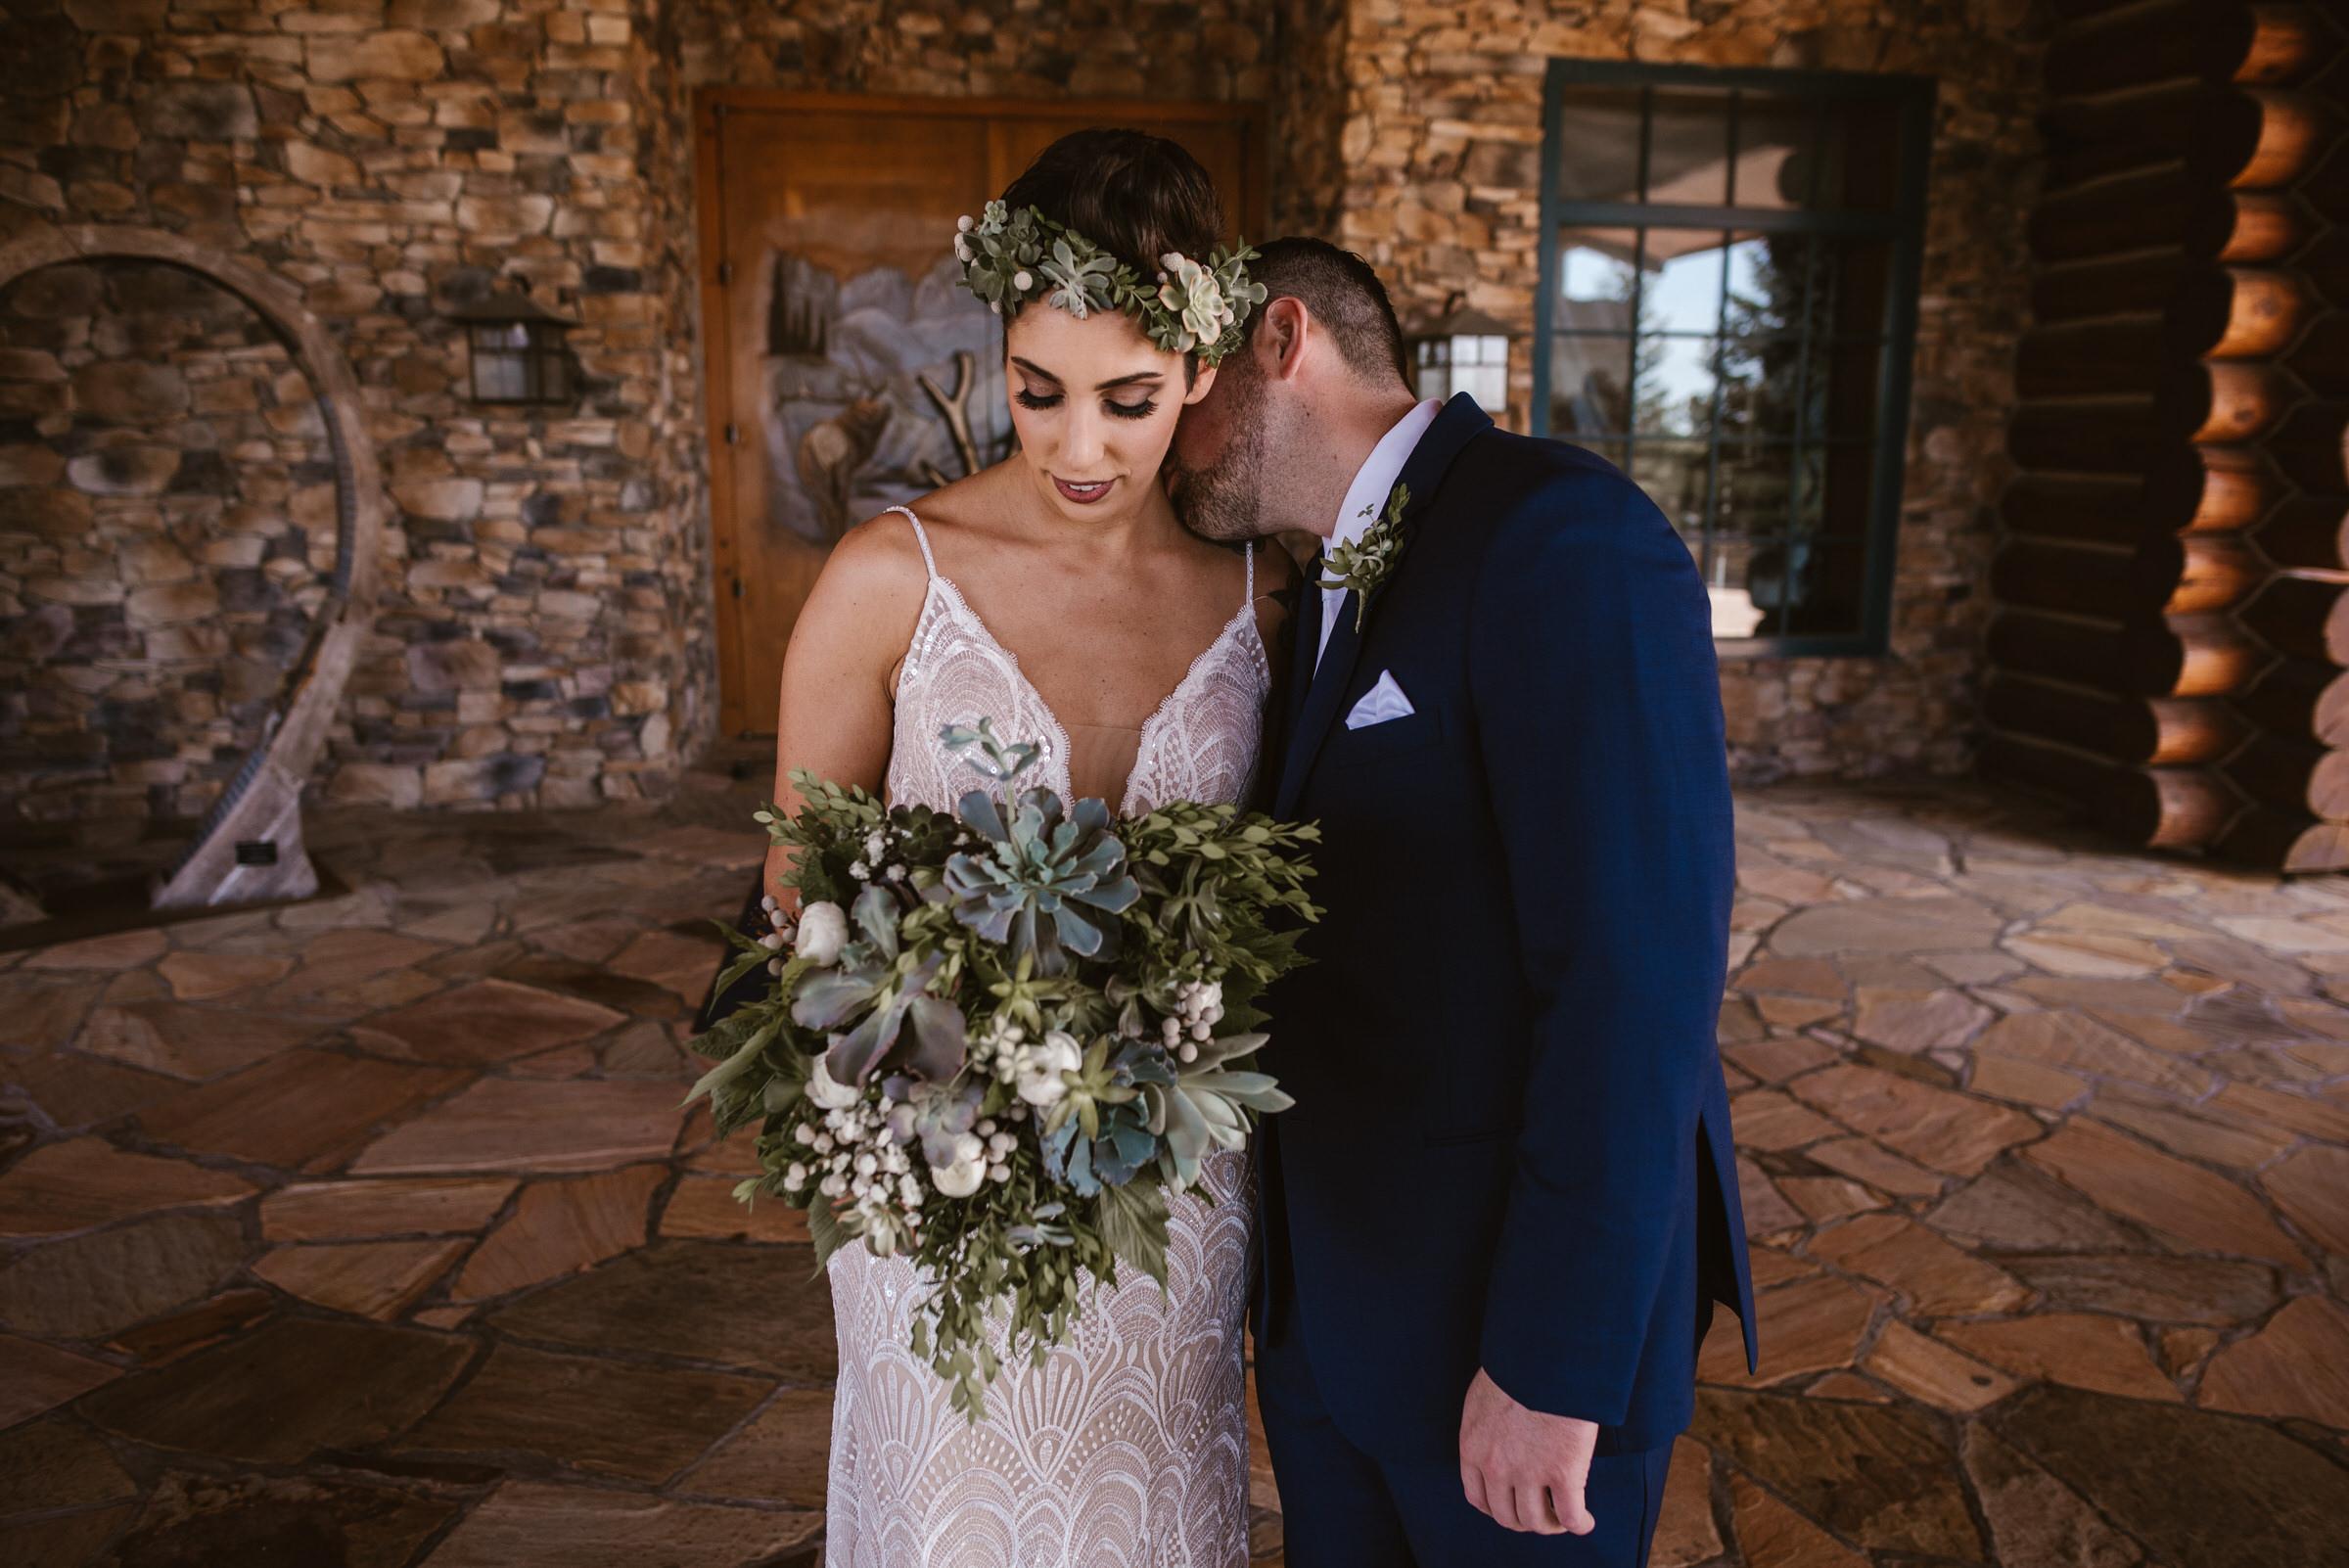 Wilderness-Ridge-Lincoln-Nebraska-Wedding-Kaylie-Sirek-Photography-032.jpg